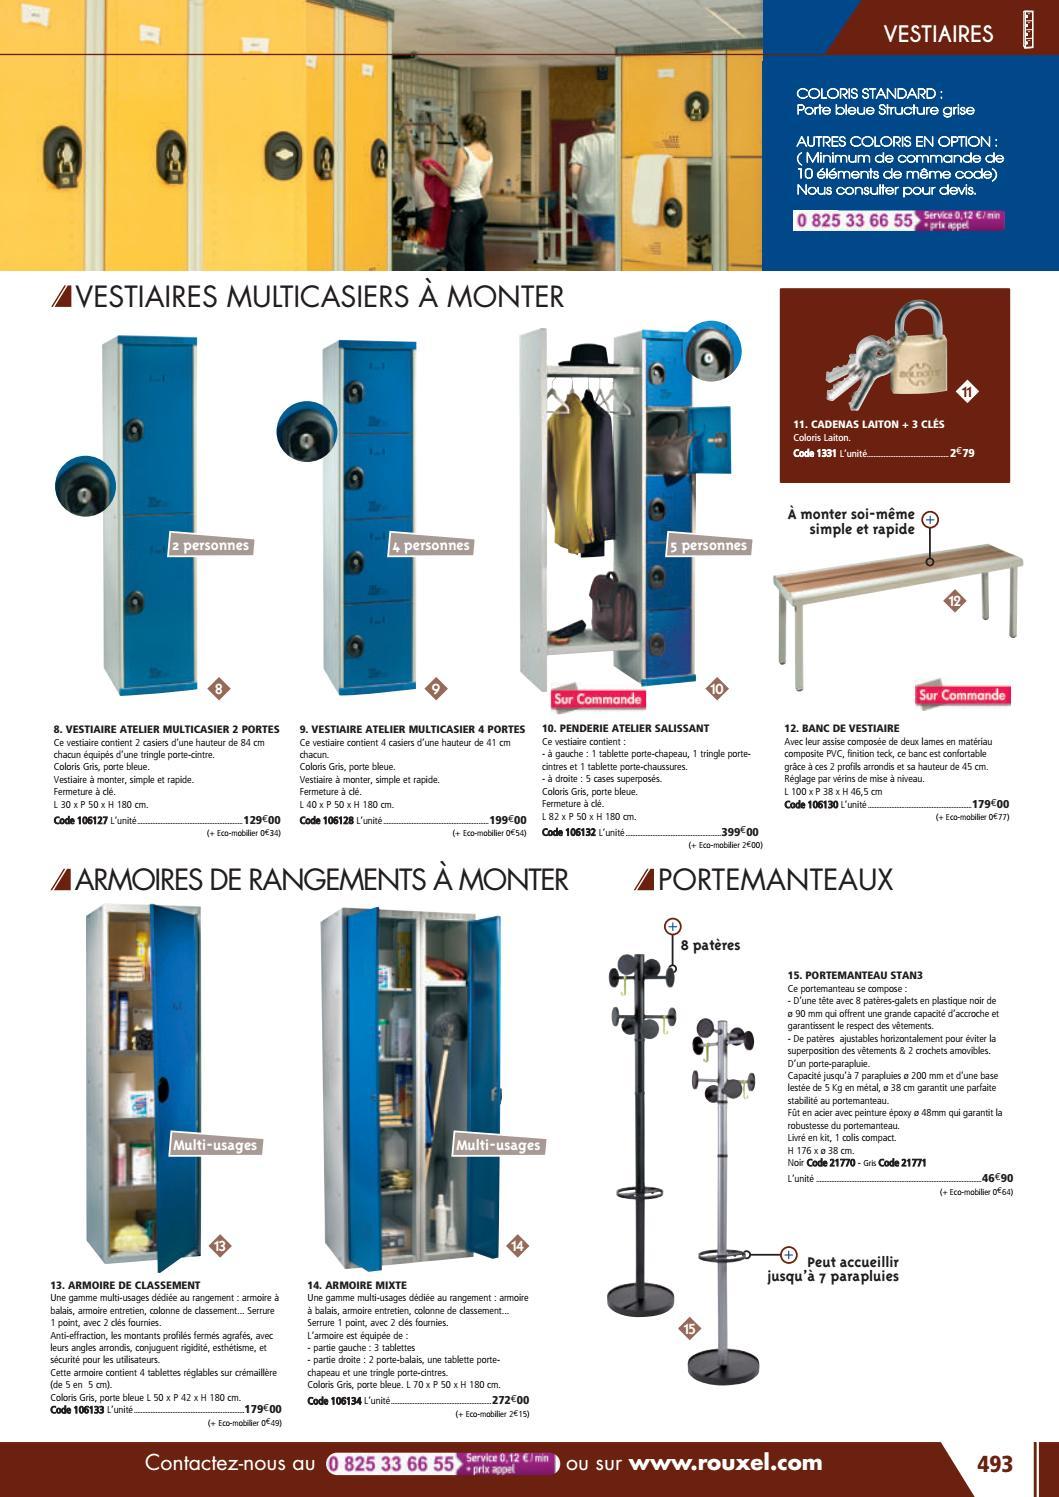 Catalogue Général Rouxel 2018 by Rouxel - issuu 0582e3d4abf